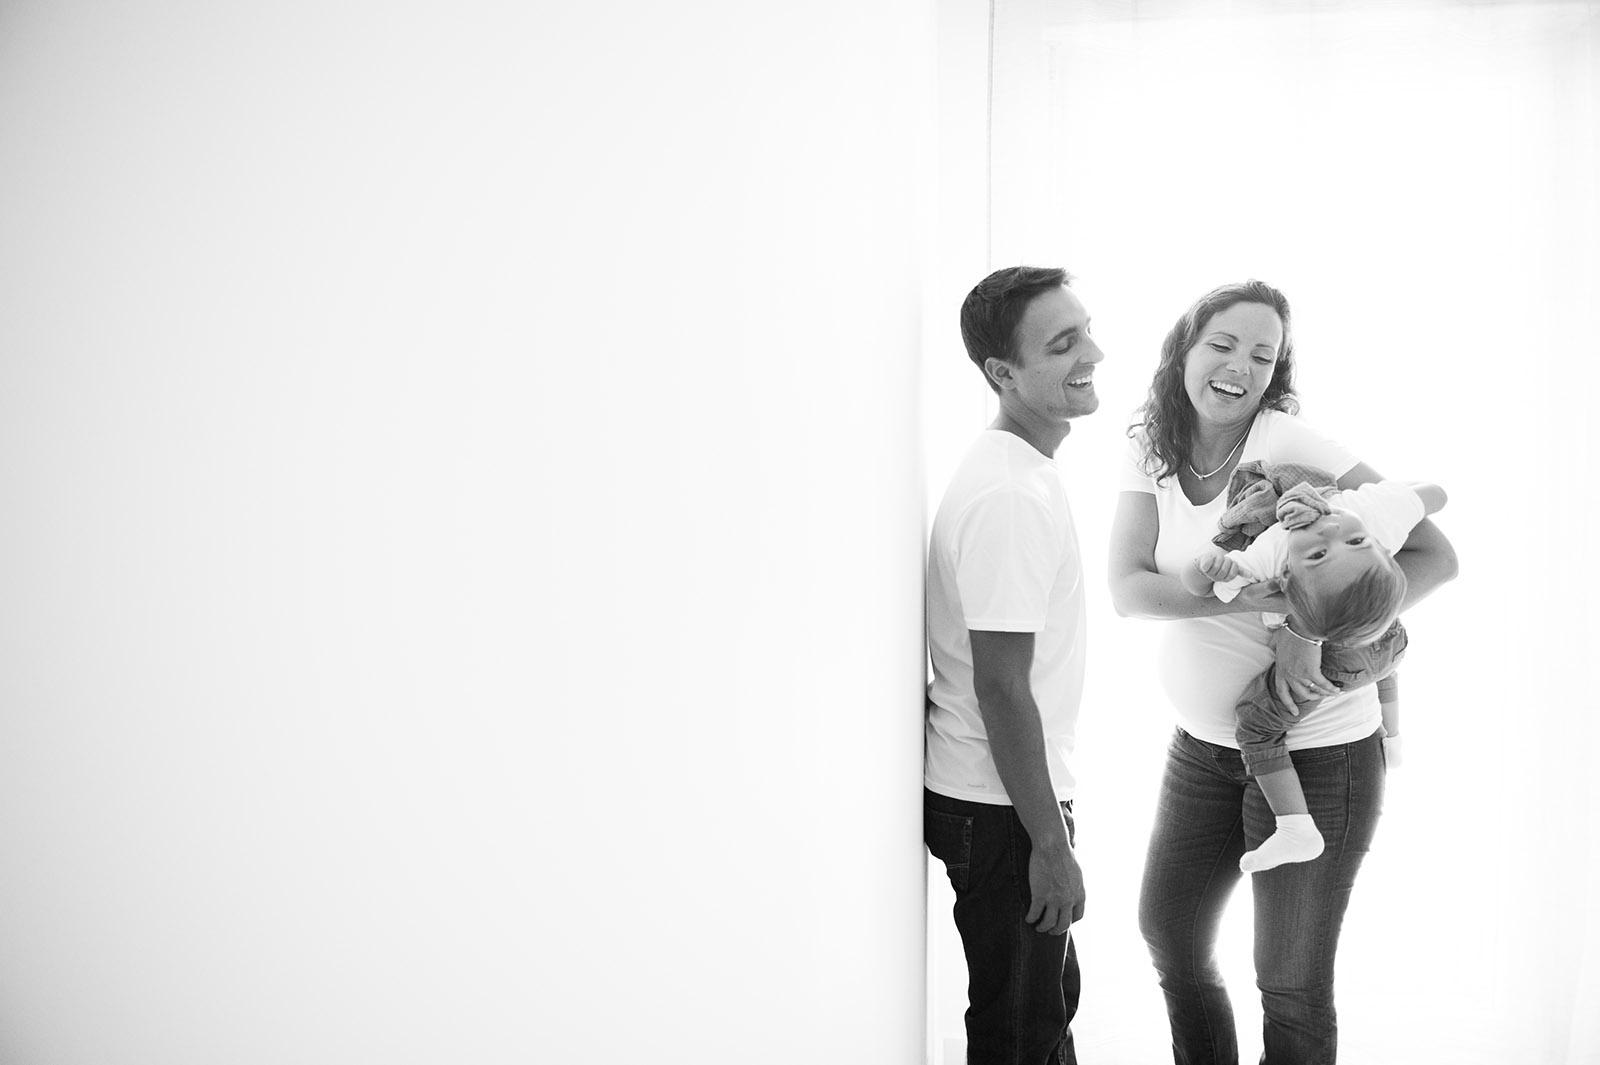 seance-photo-famille-photo-grossesse-photo-bébé-naissance-sabrina-godemert-photographe-seine-et-marne017